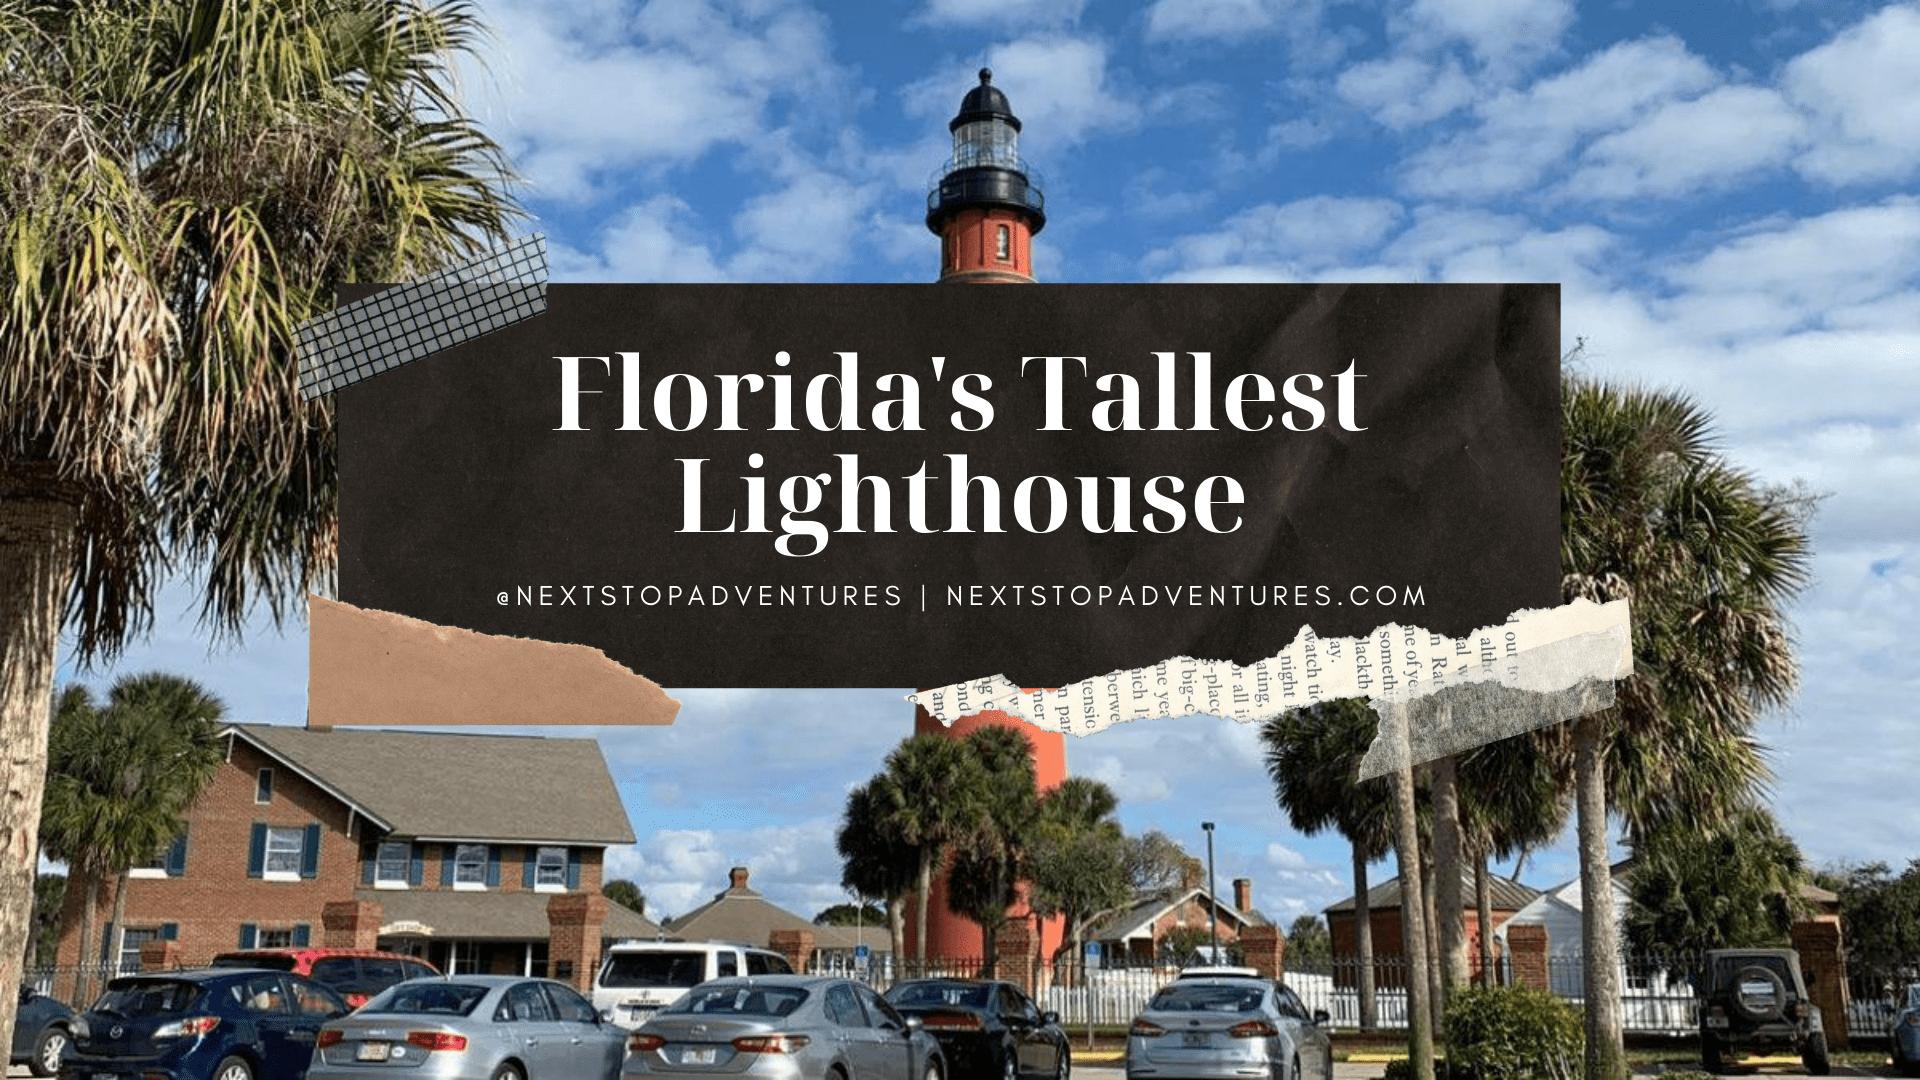 Florida's tallest lighthouse